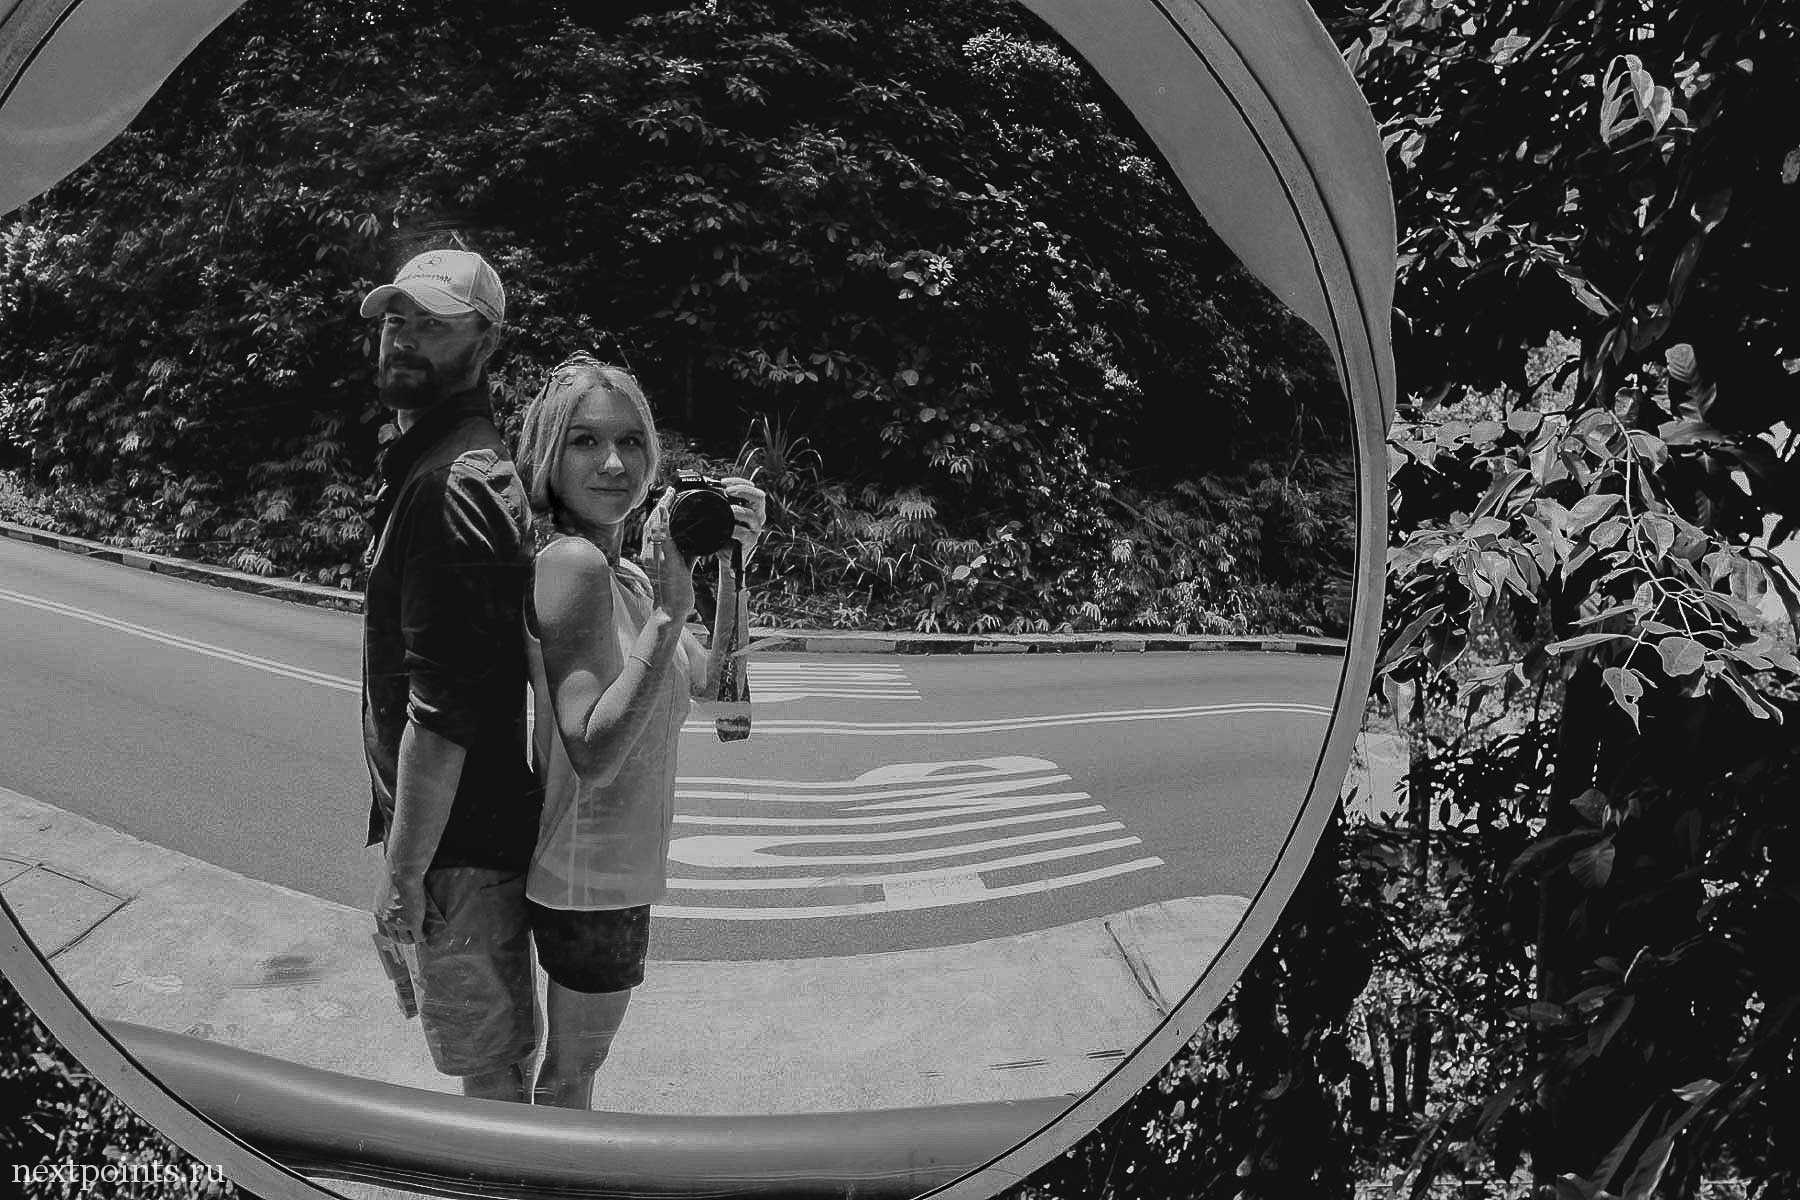 В отражении зеркала на повороте дороги